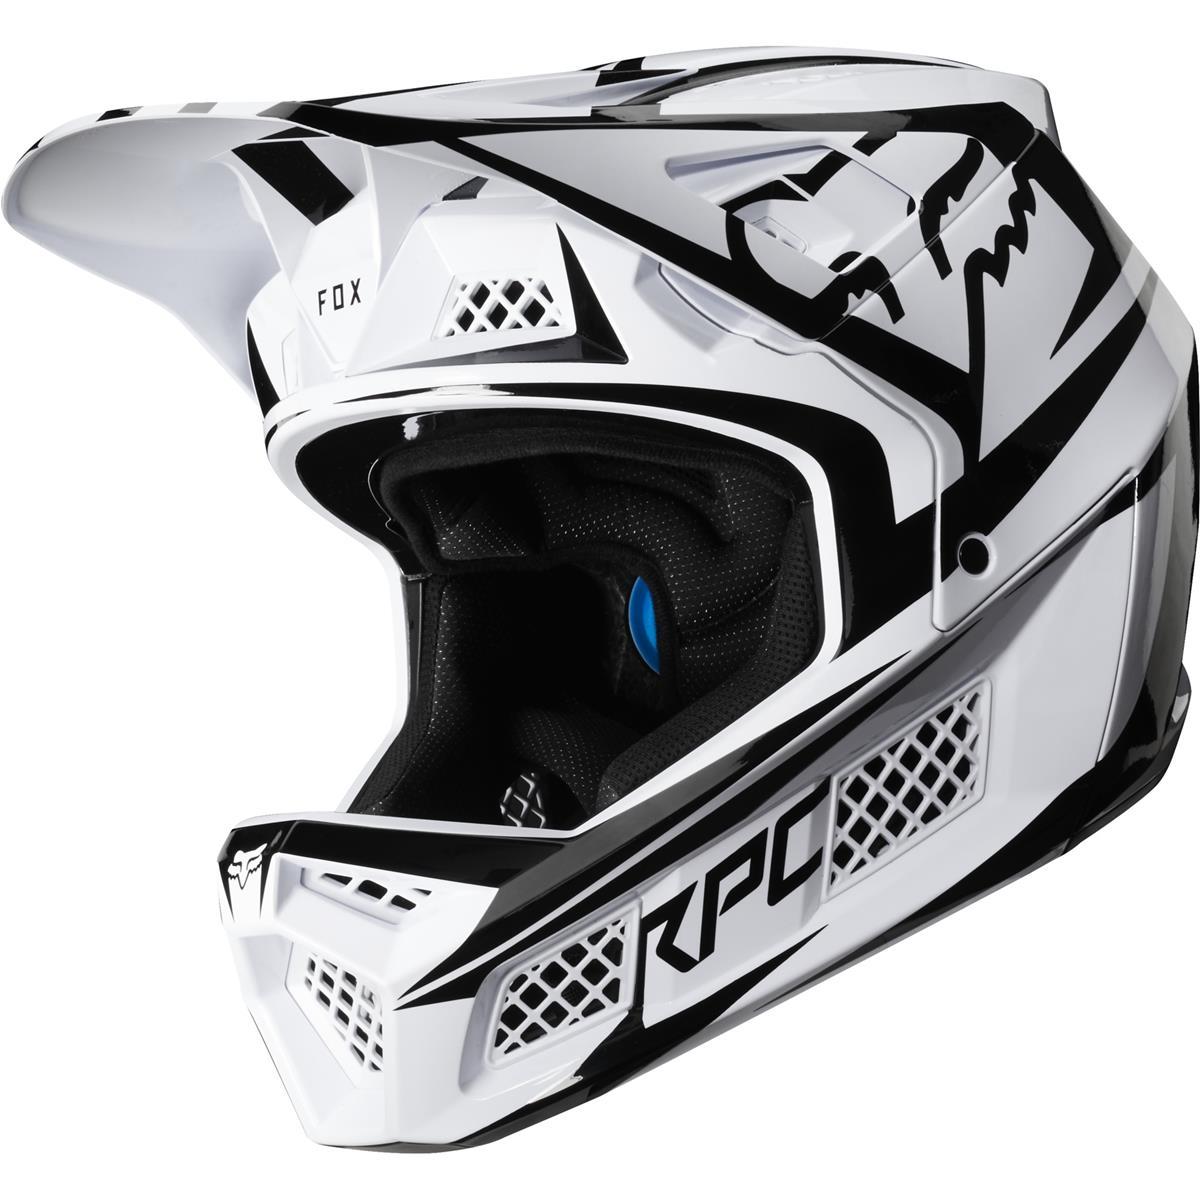 Fox Downhill-MTB Helm Rampage Pro Carbon Beast - Carbon Weiß